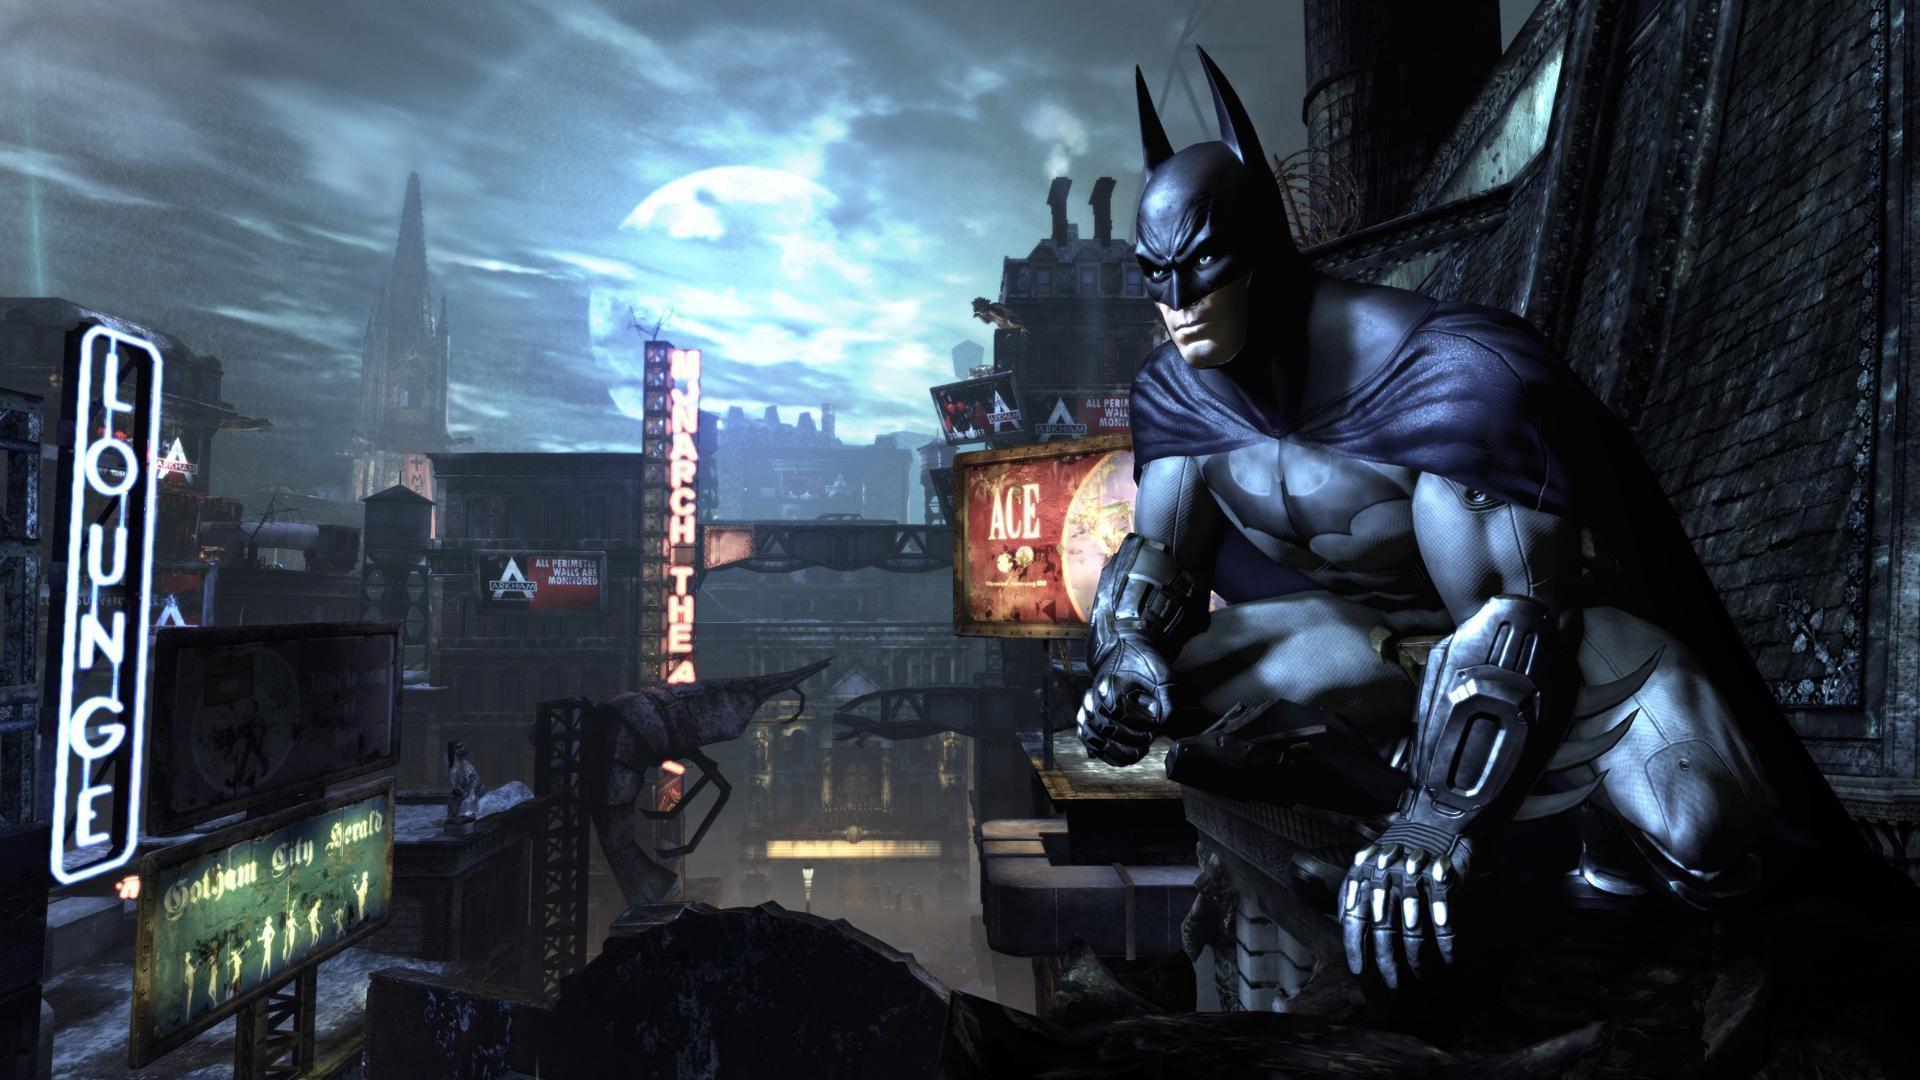 Wallpaper HD Batman Arkham City HD Wallpapers 1920x1080